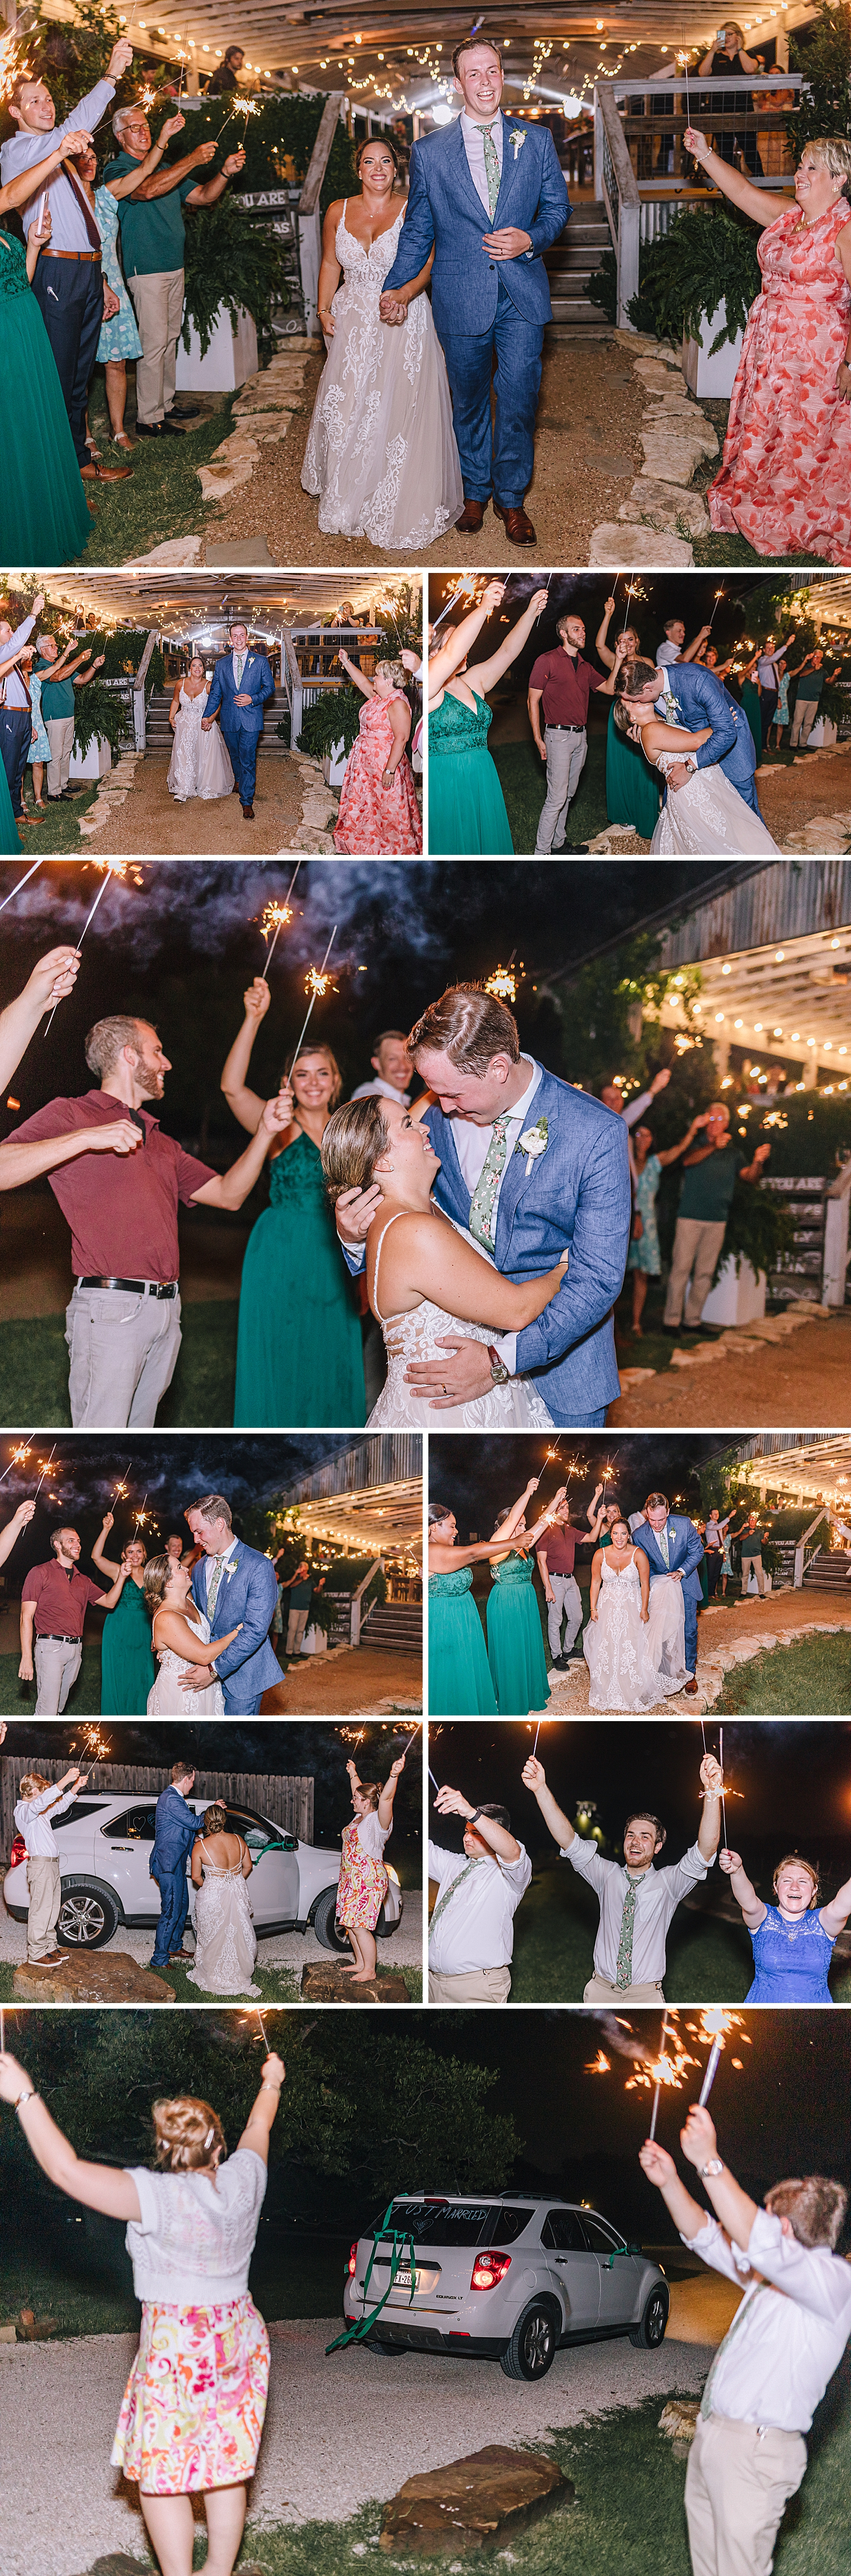 Gruene-Estate-Wedding-New-Braunfels-Bride-Wedding-Photos-Carly-Barton-Photography_0156.jpg